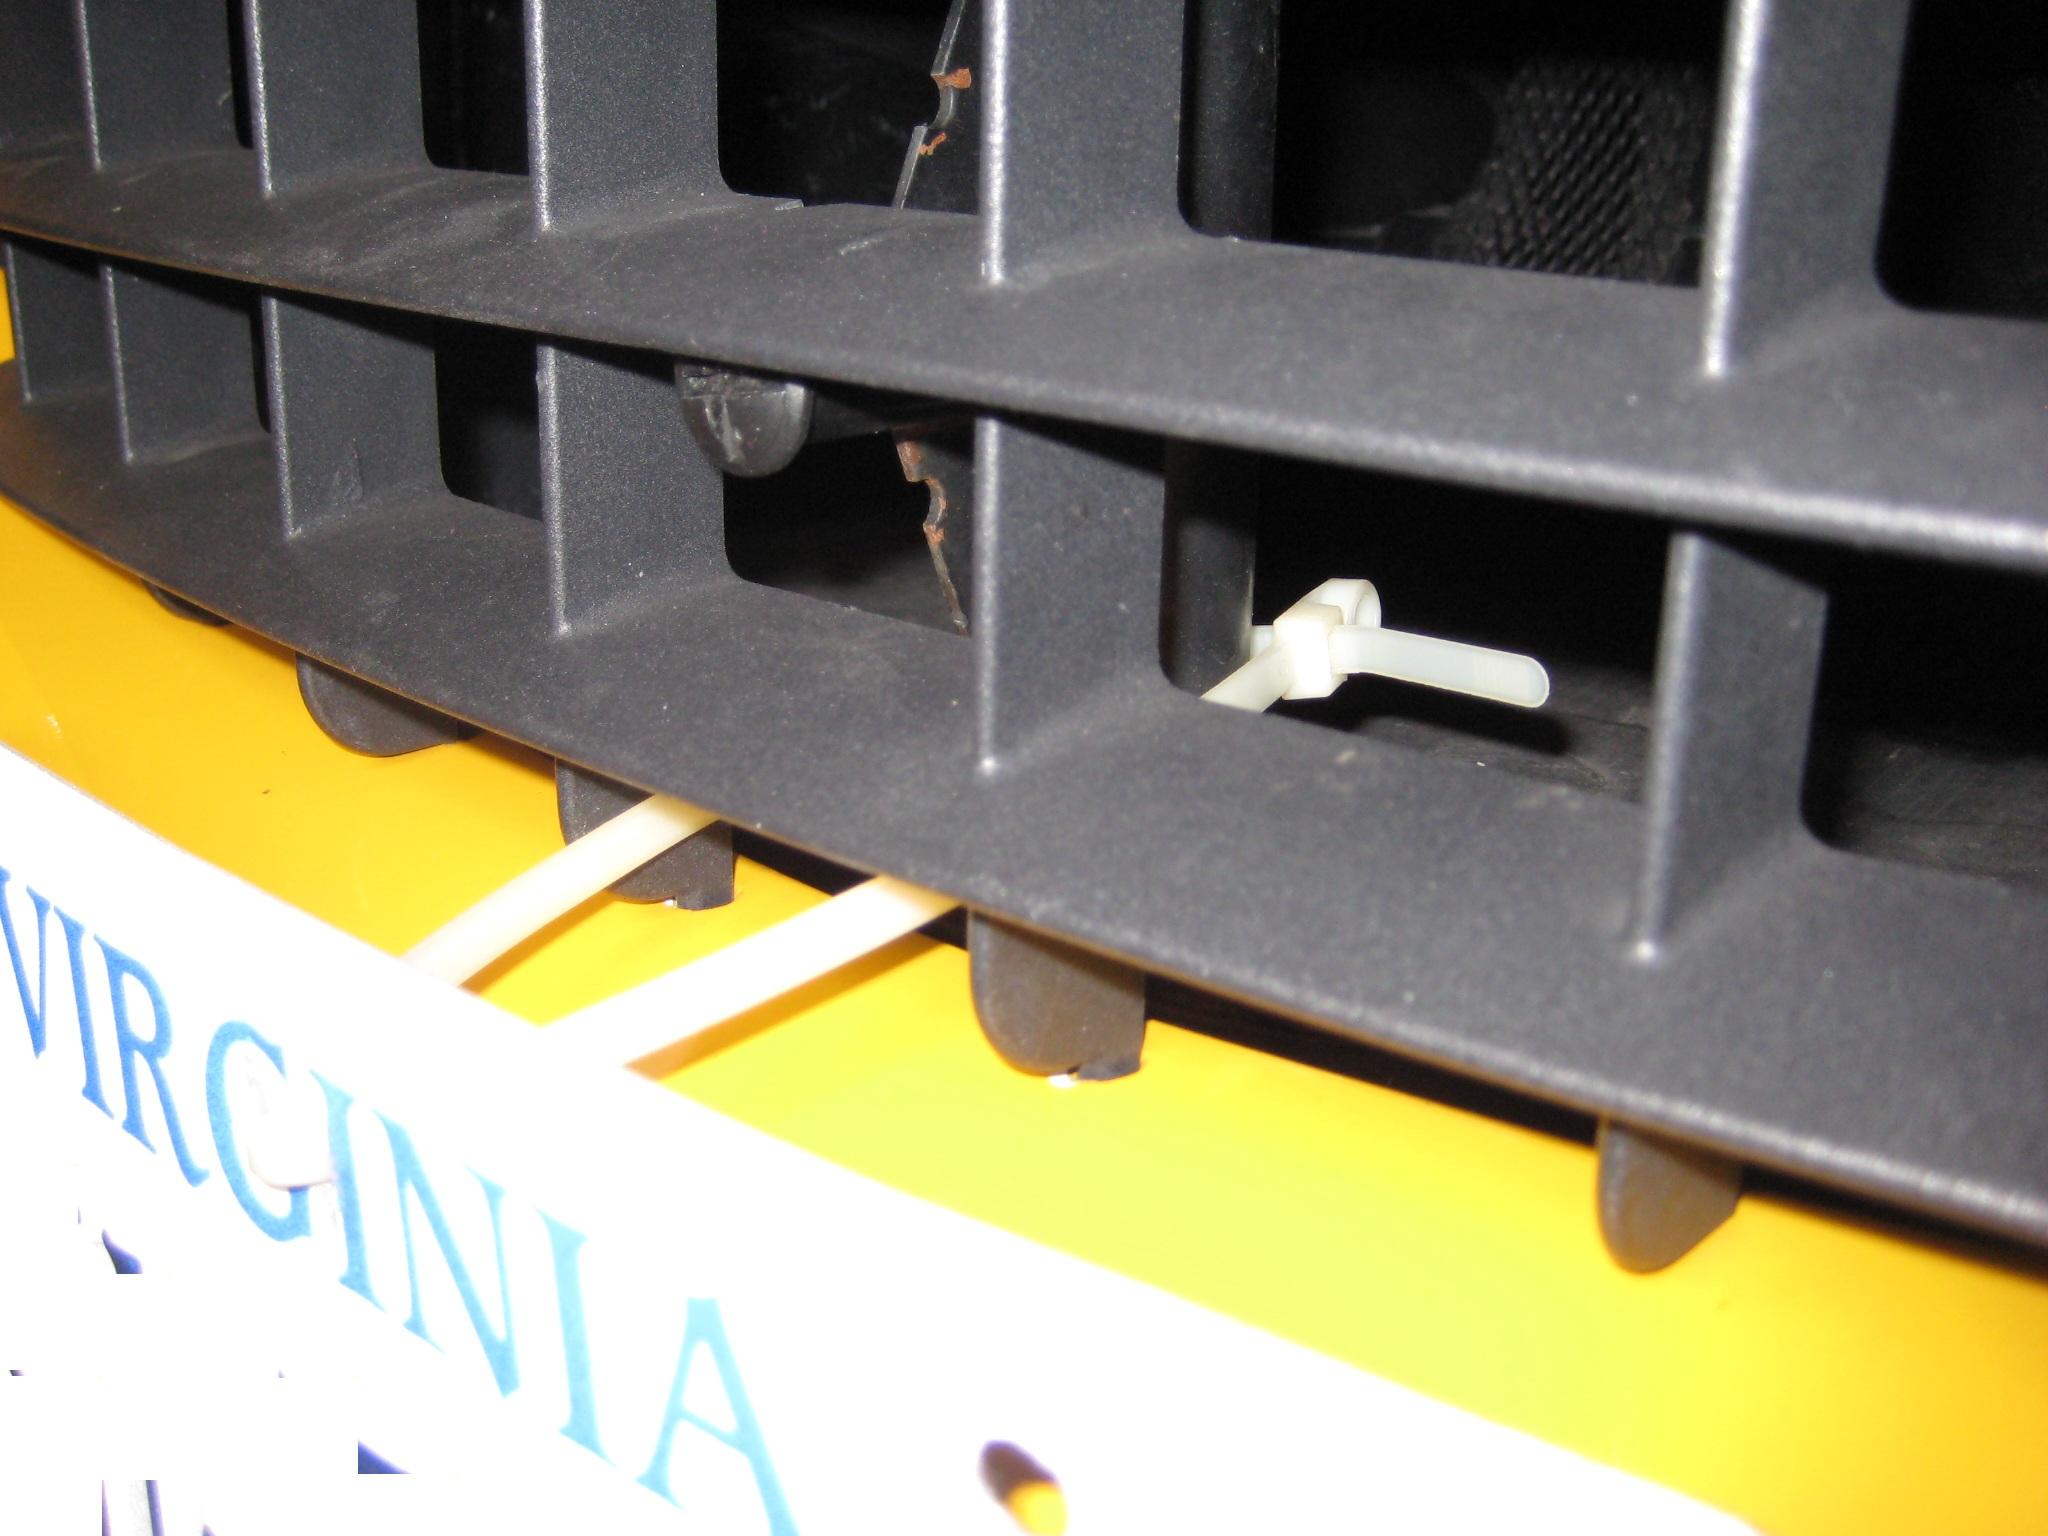 Spoiler anteriore senza posrtatarga 184021d1334588757-pulled-over-no-front-license-plate-img_0405